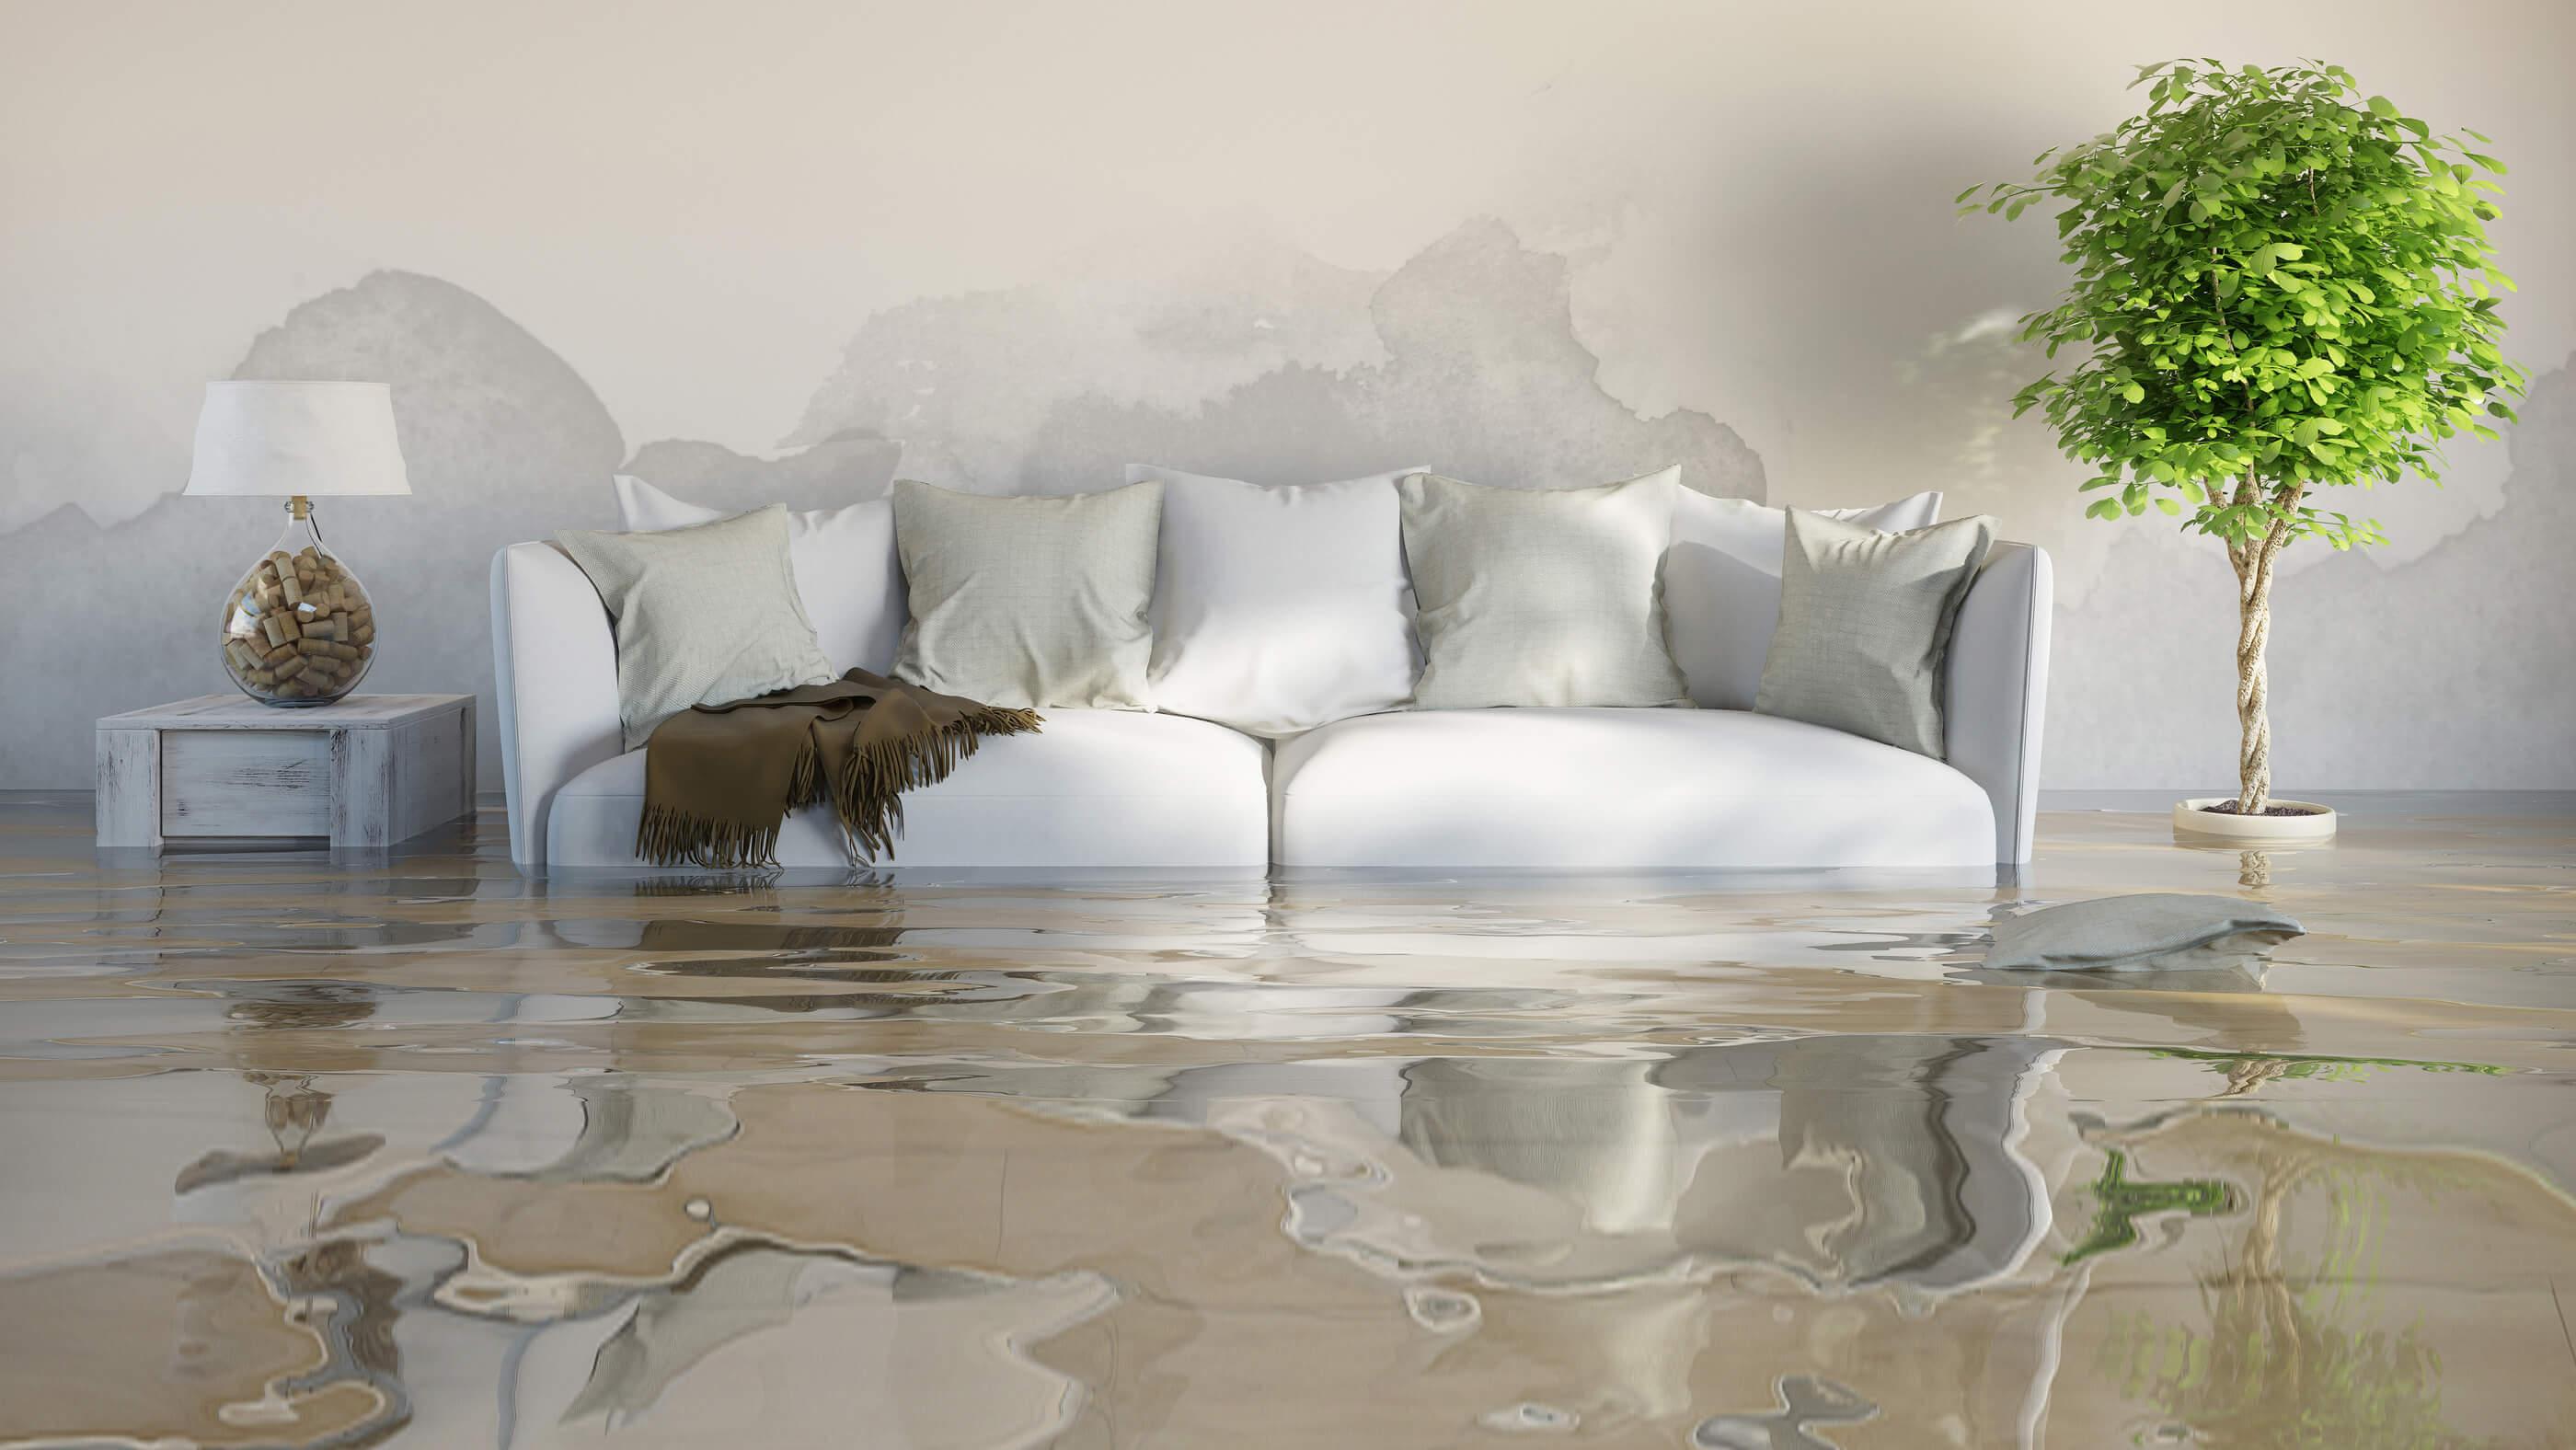 San Diego Flood Services